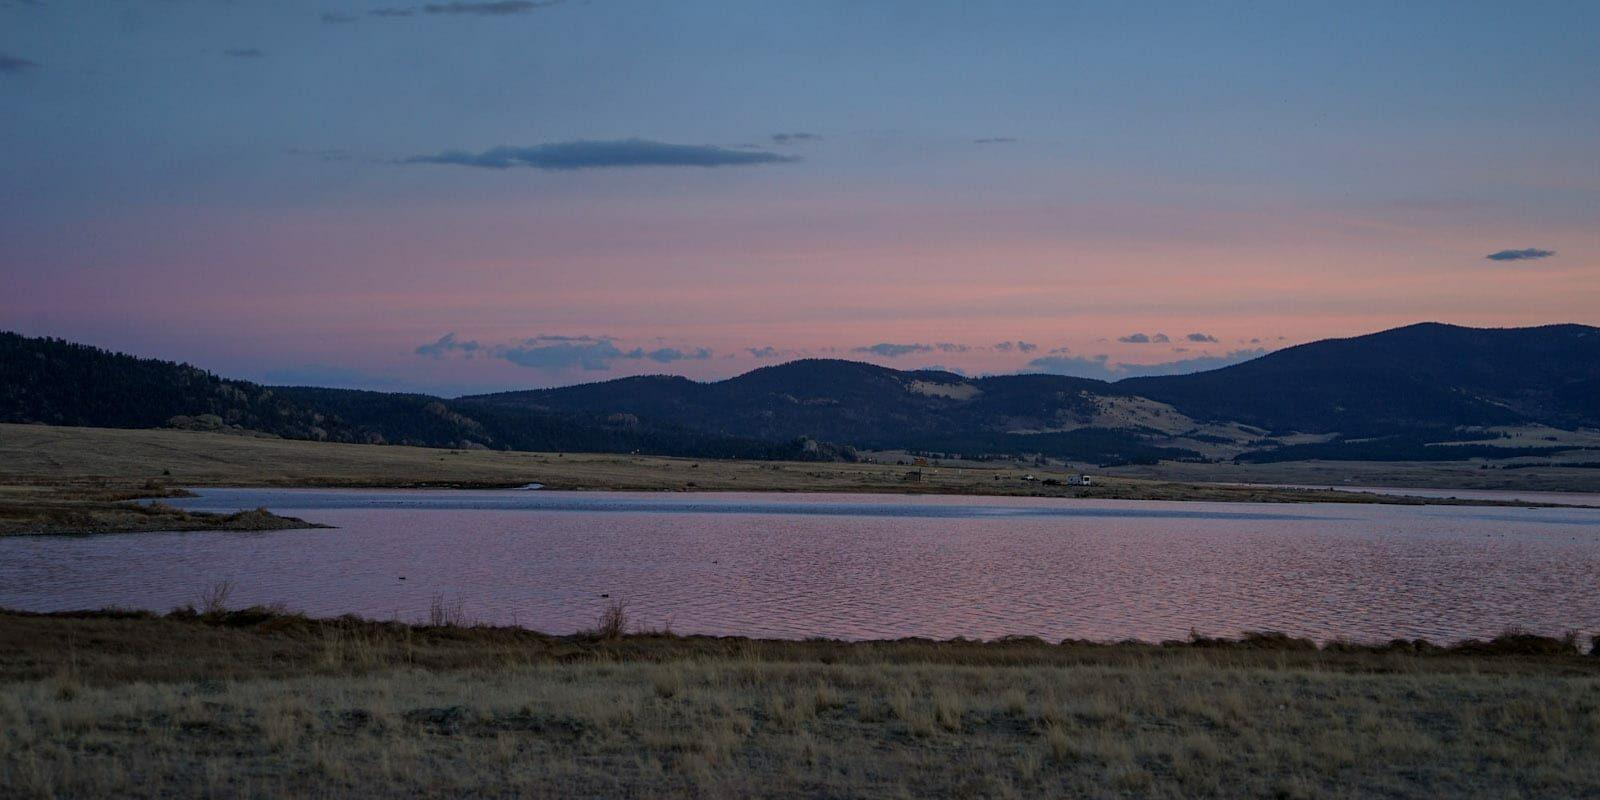 Camping Eleven Mile Reservoir Sunset Lake George CO